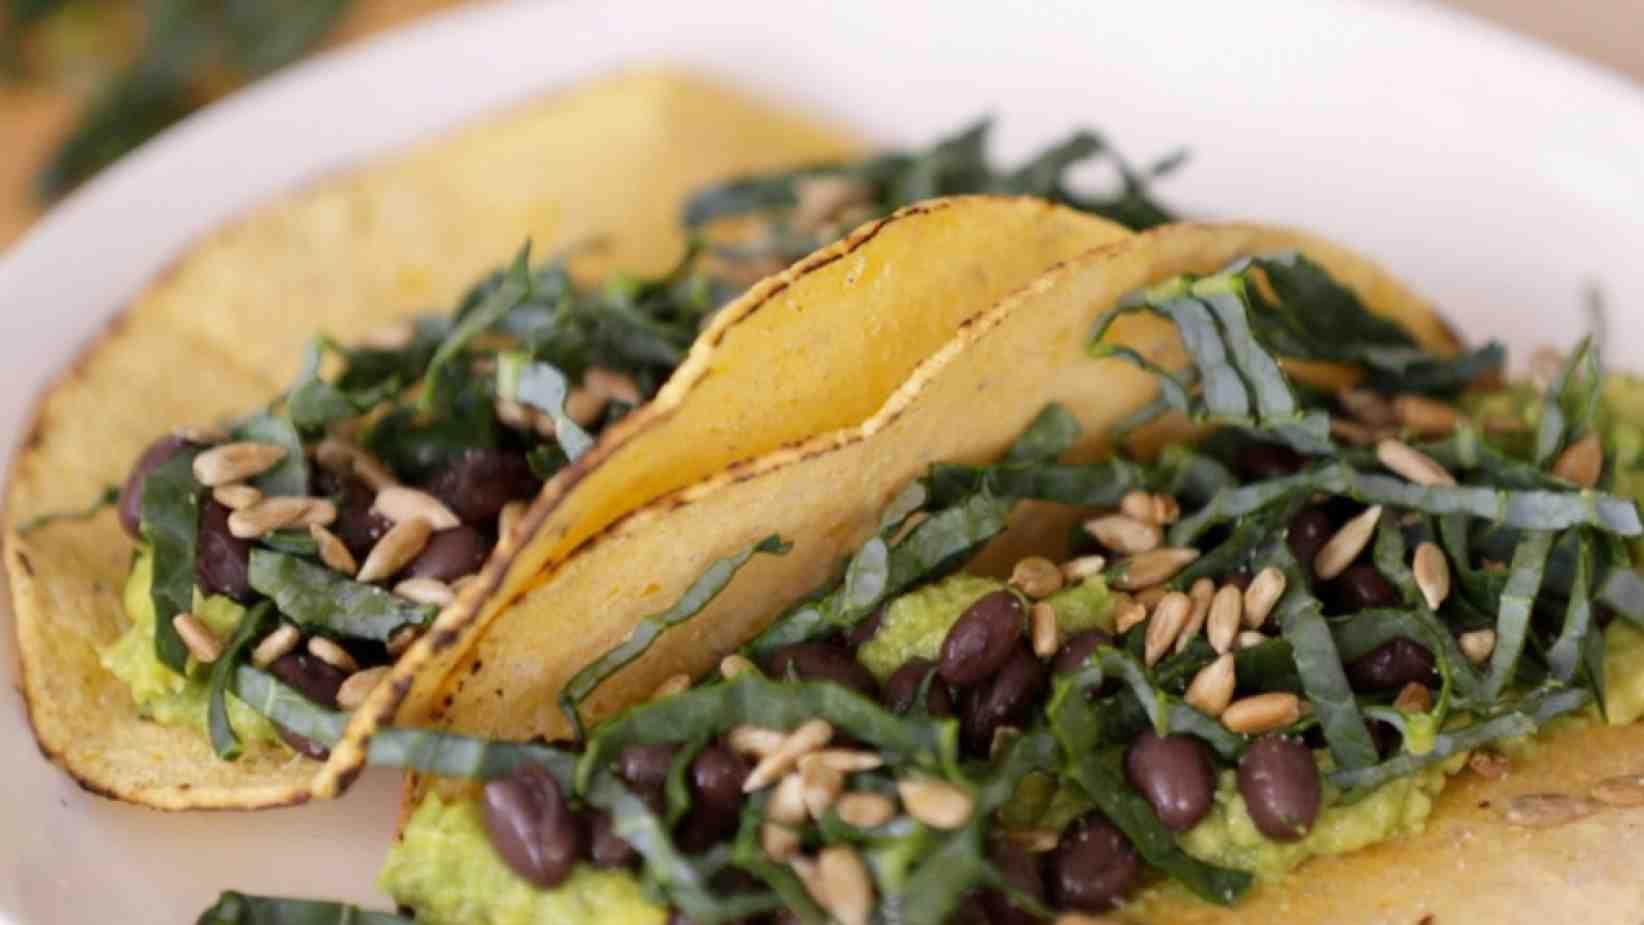 Martha stewart mexican food recipes Chipotle Chicken Tacos With Radish Salad Recipe Martha Stewart